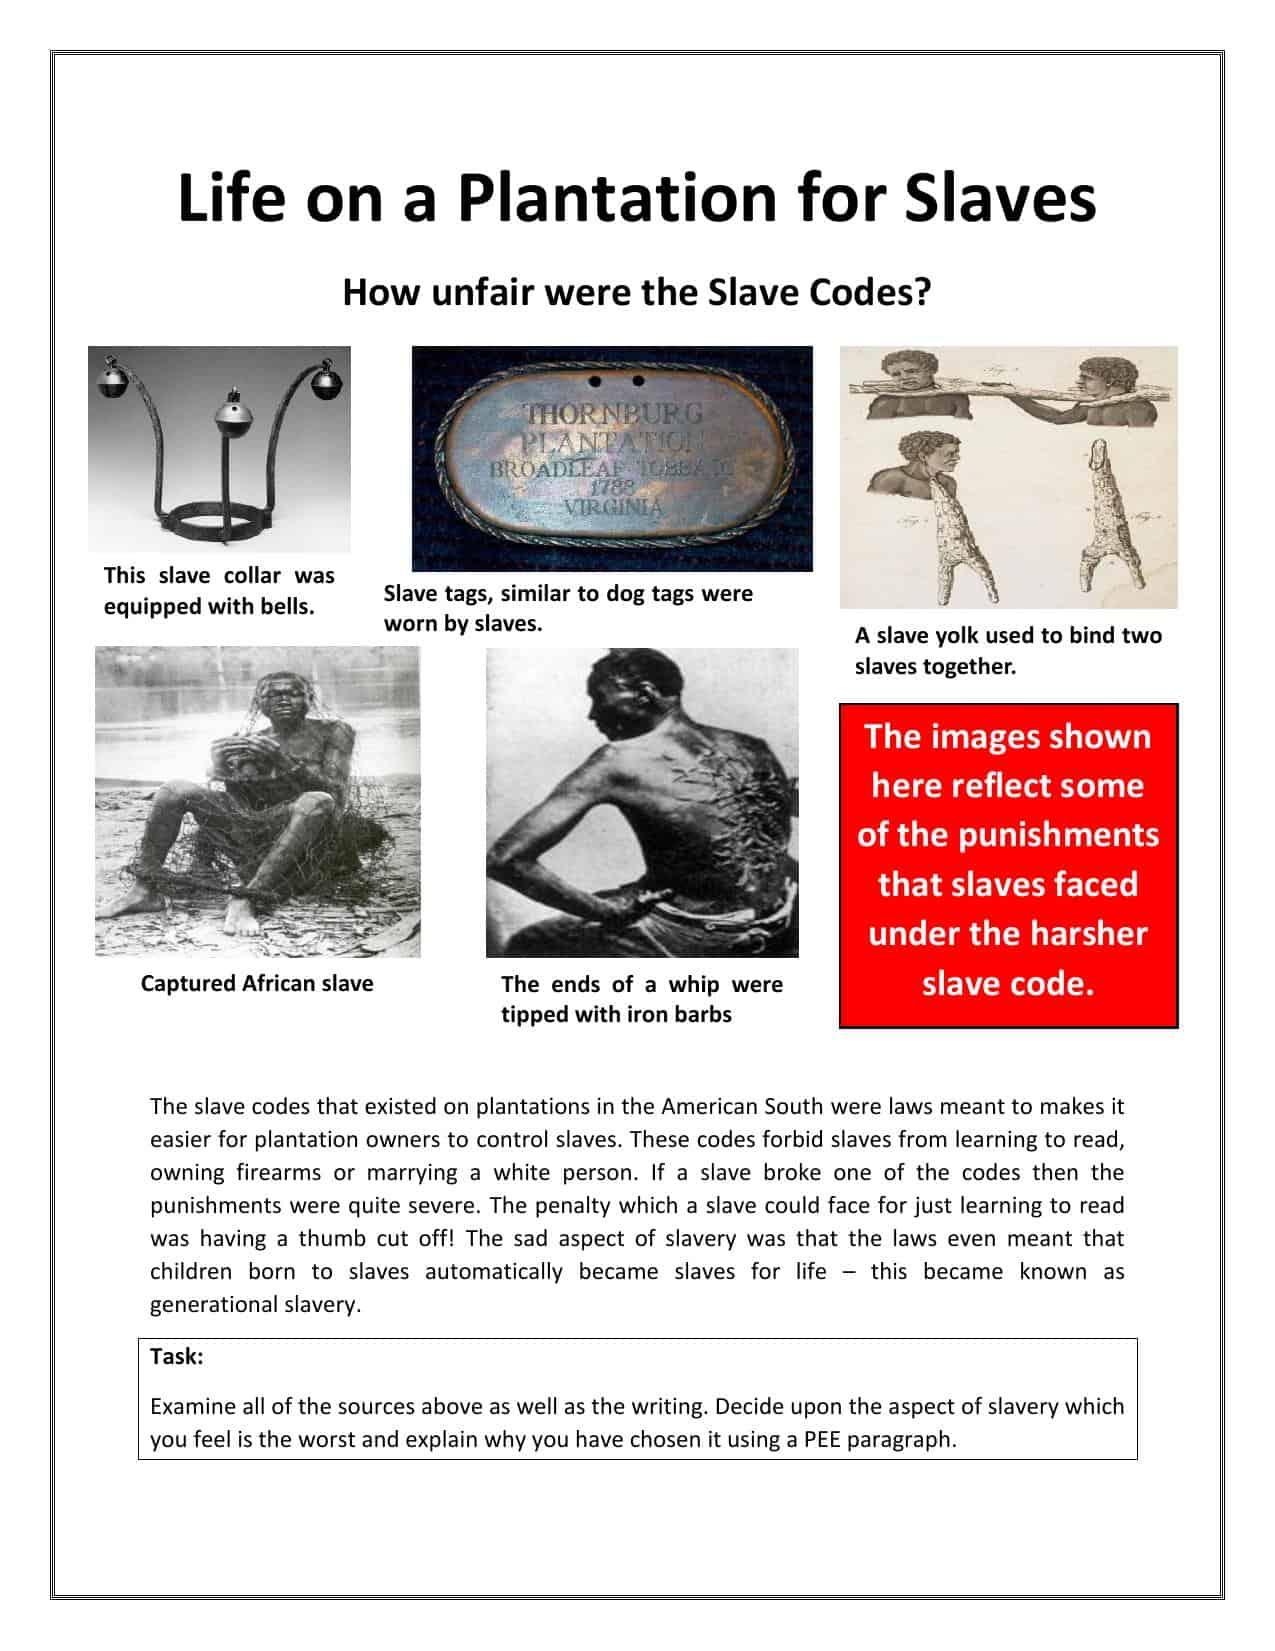 Life On A Plantation Activity Worksheet